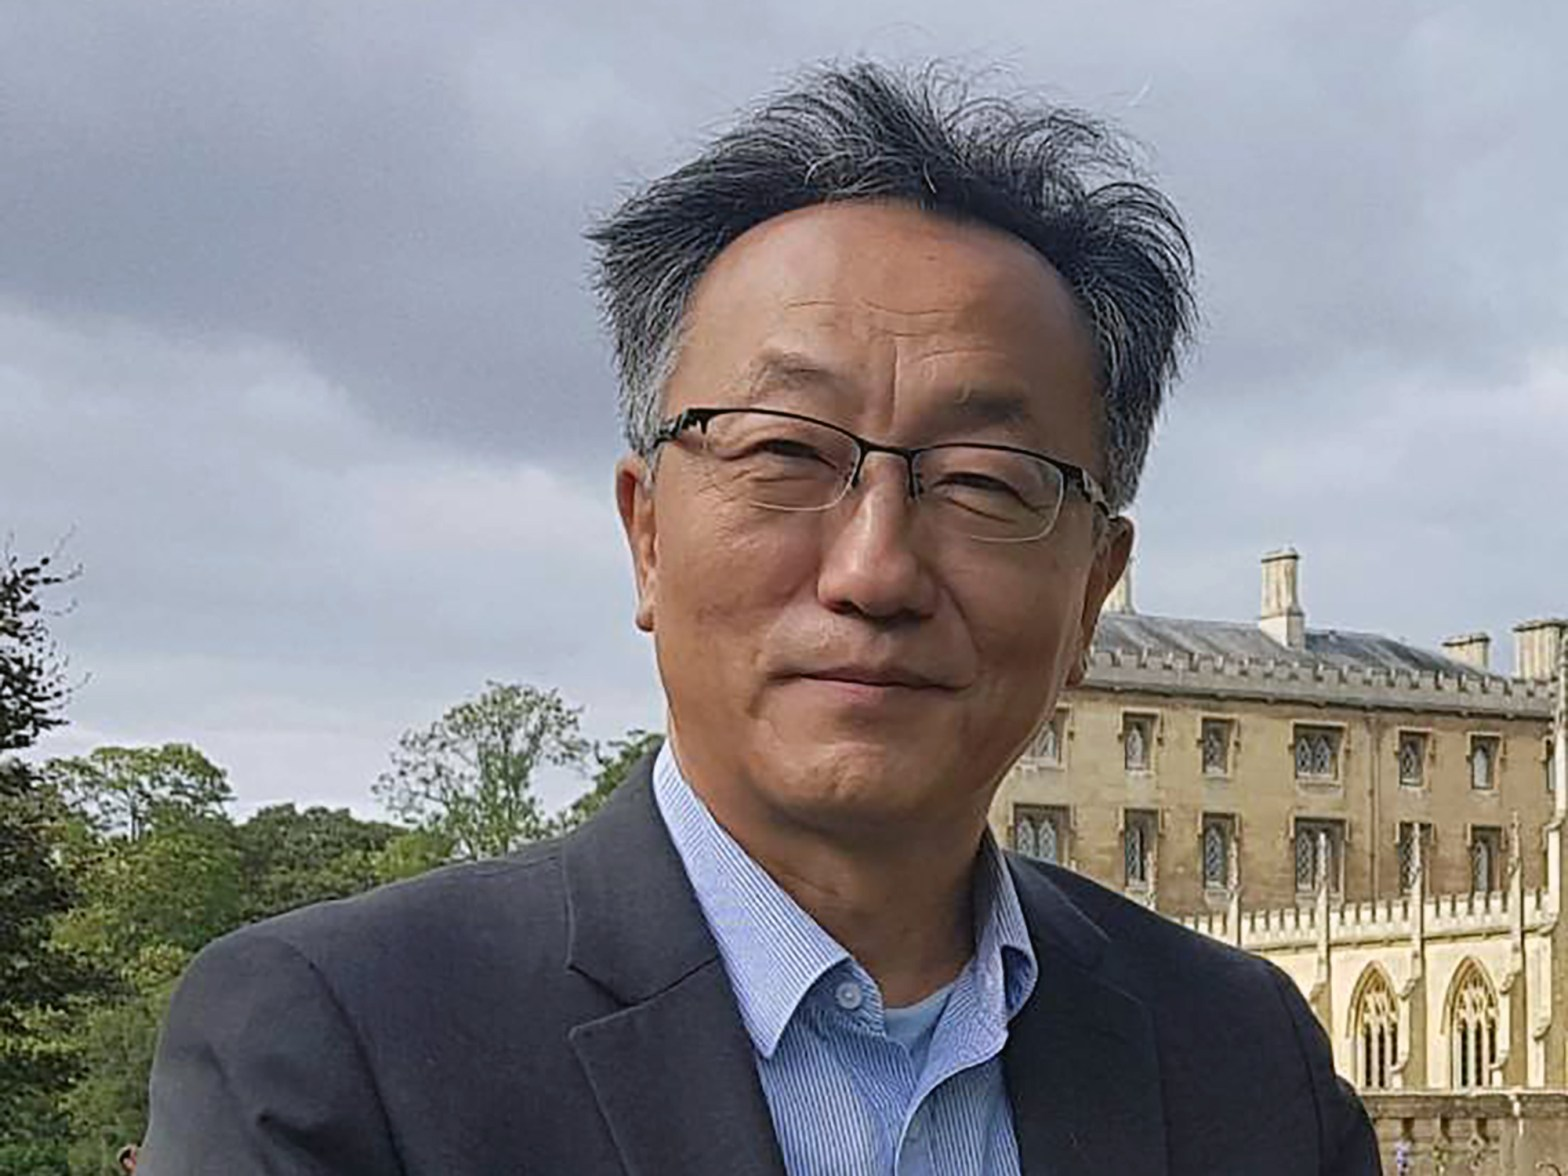 Professor Heonik Kwon, Senior Research Fellow in Social Anthropology, Fellow of Trinity College